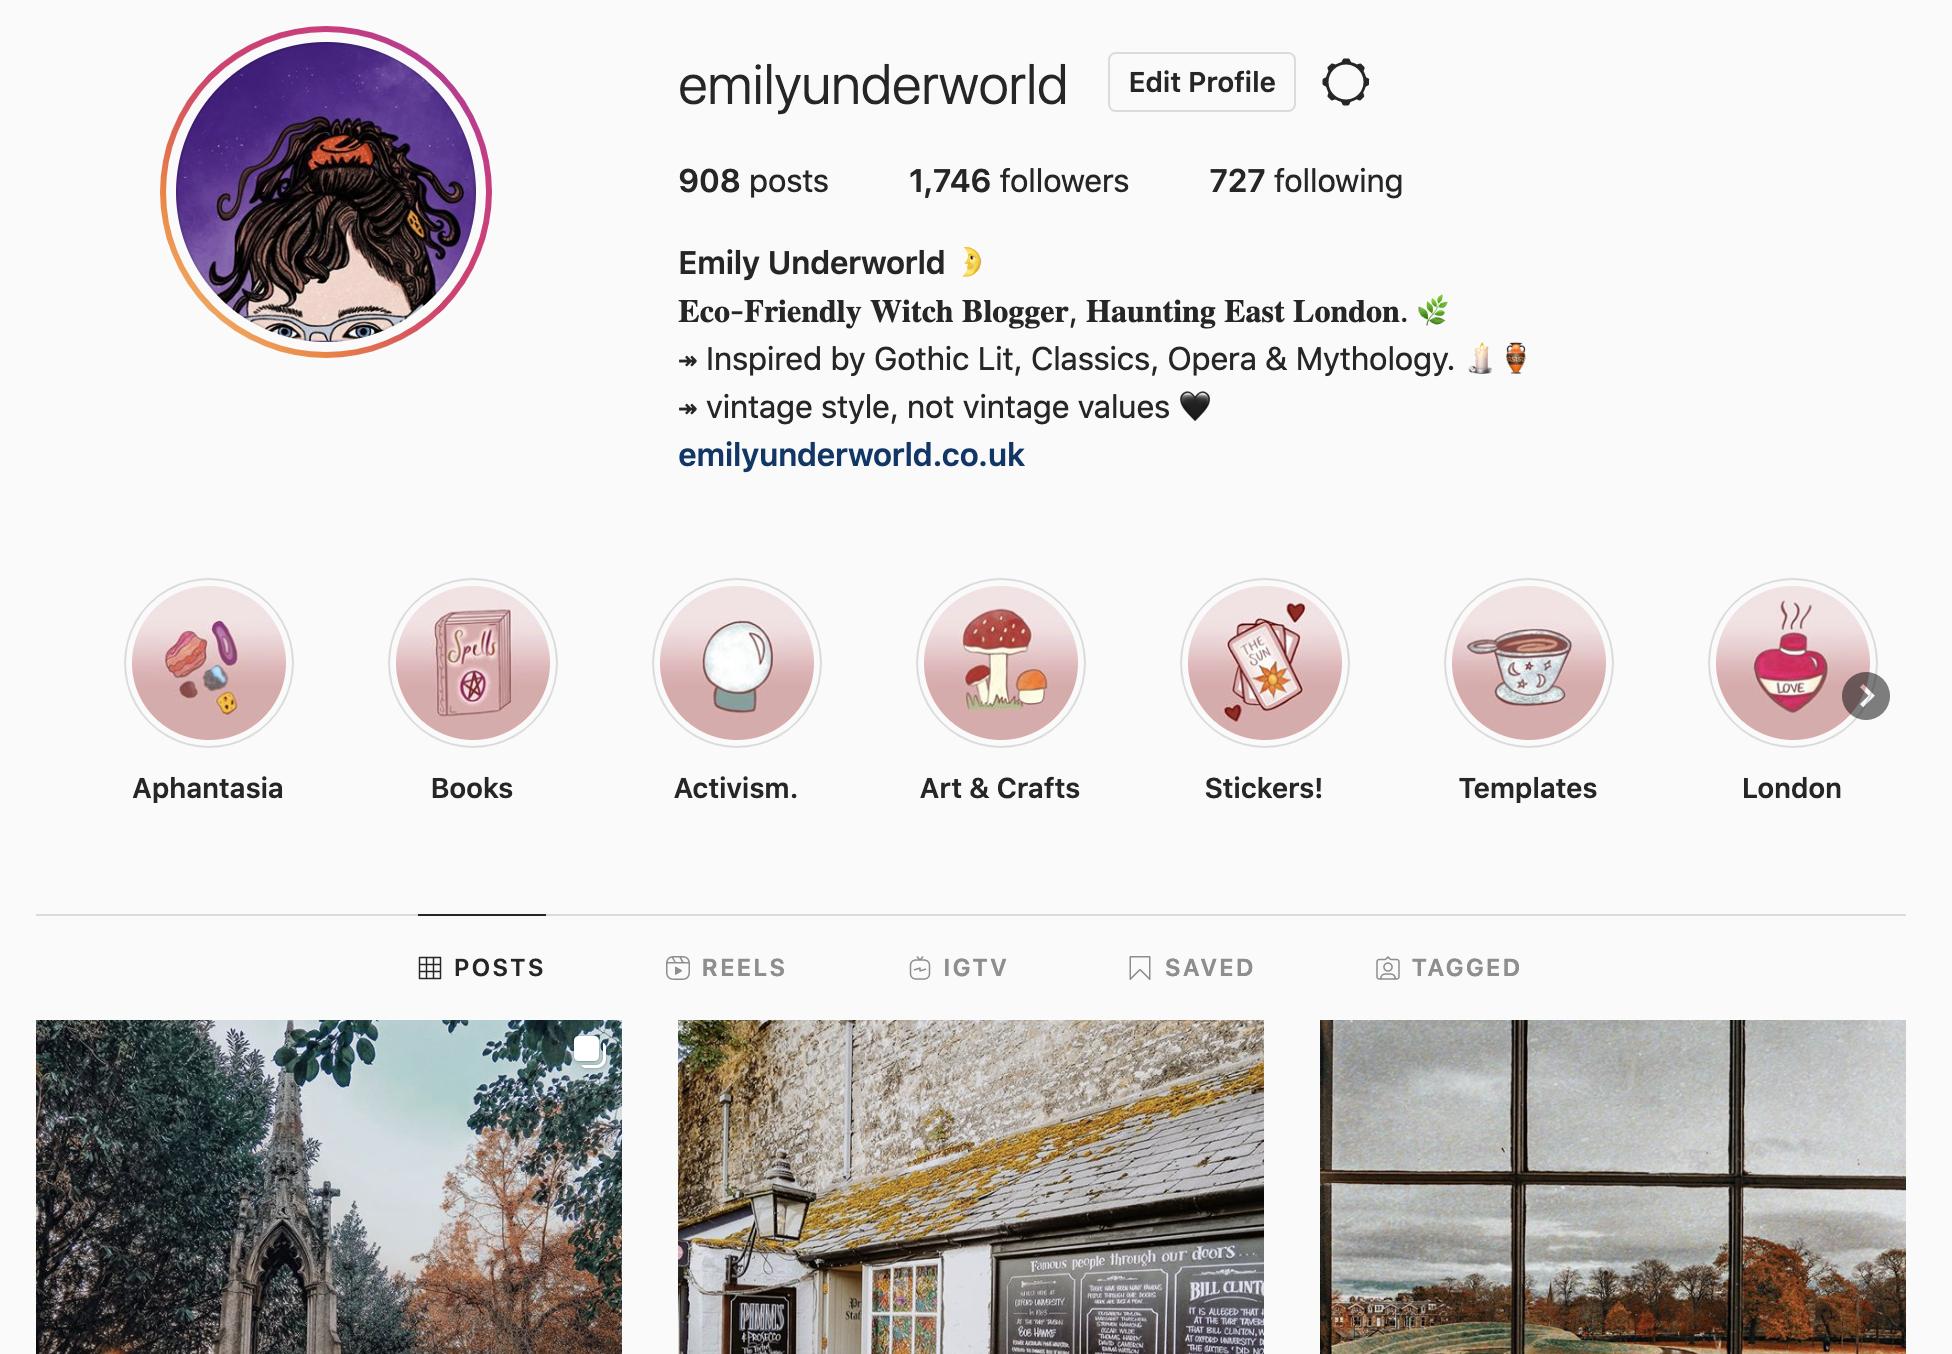 @emilyunderworld Instagram Profile, showing Story Highlight icons.